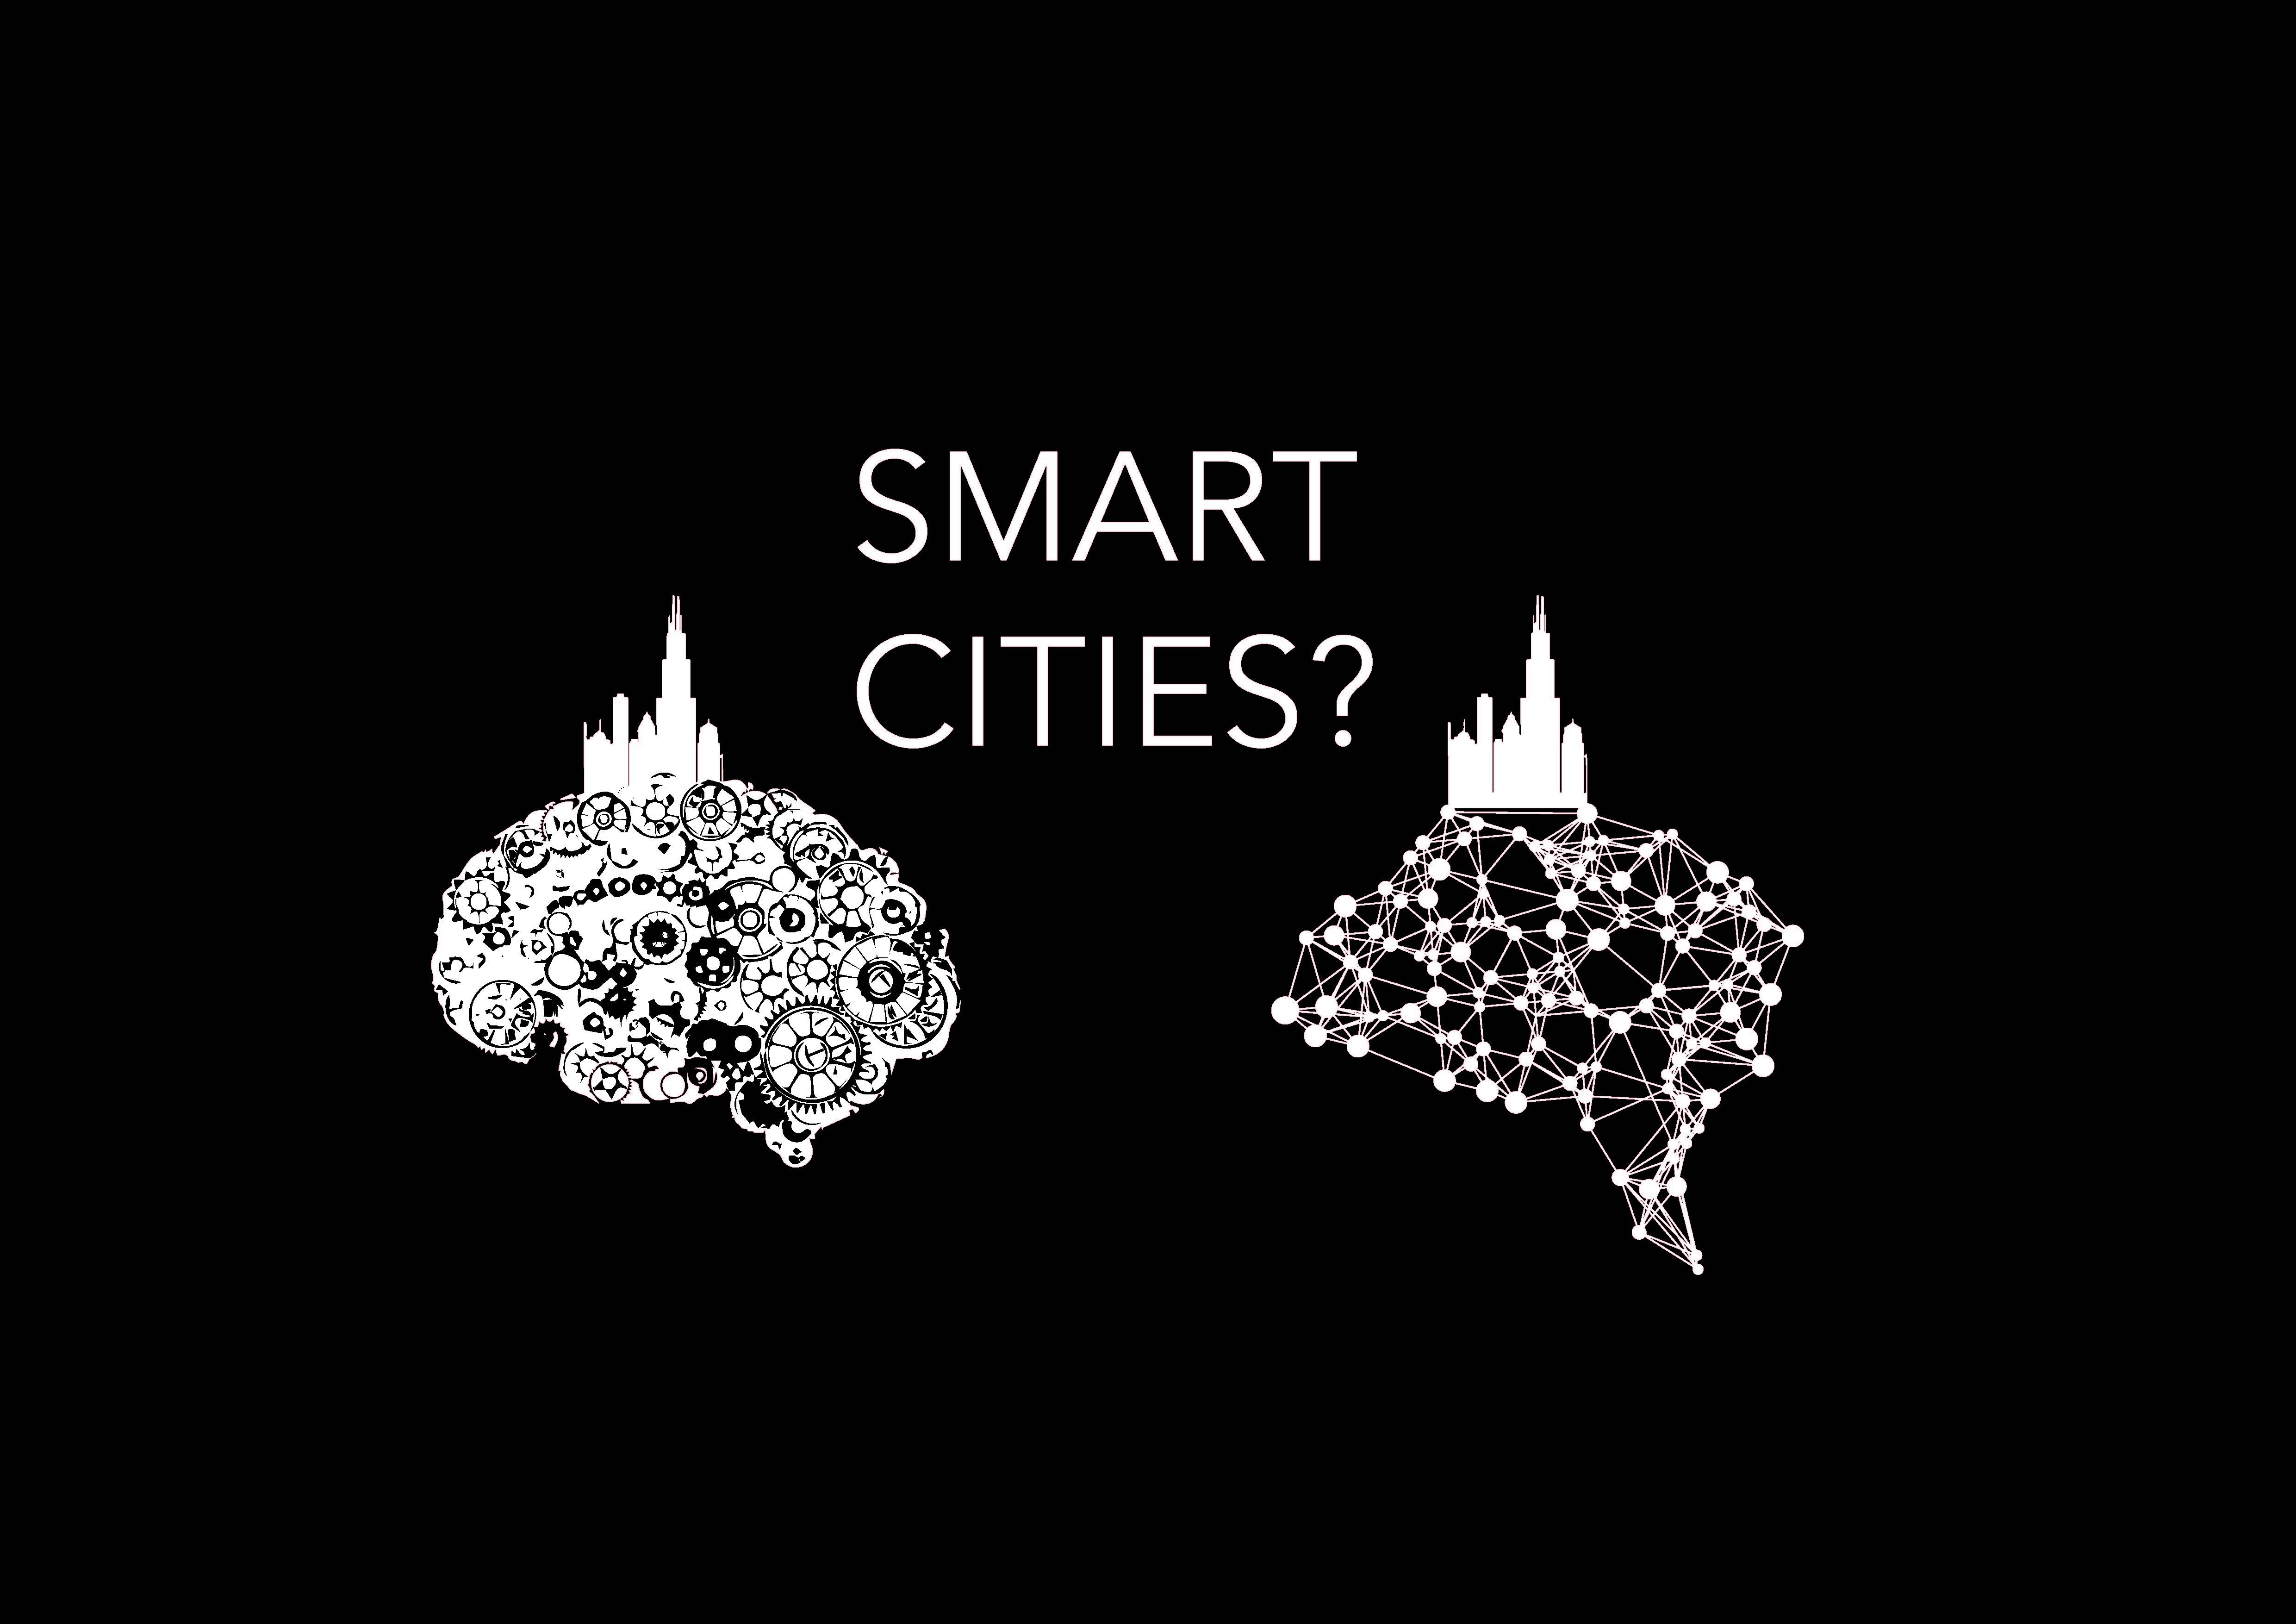 smartcities22-01